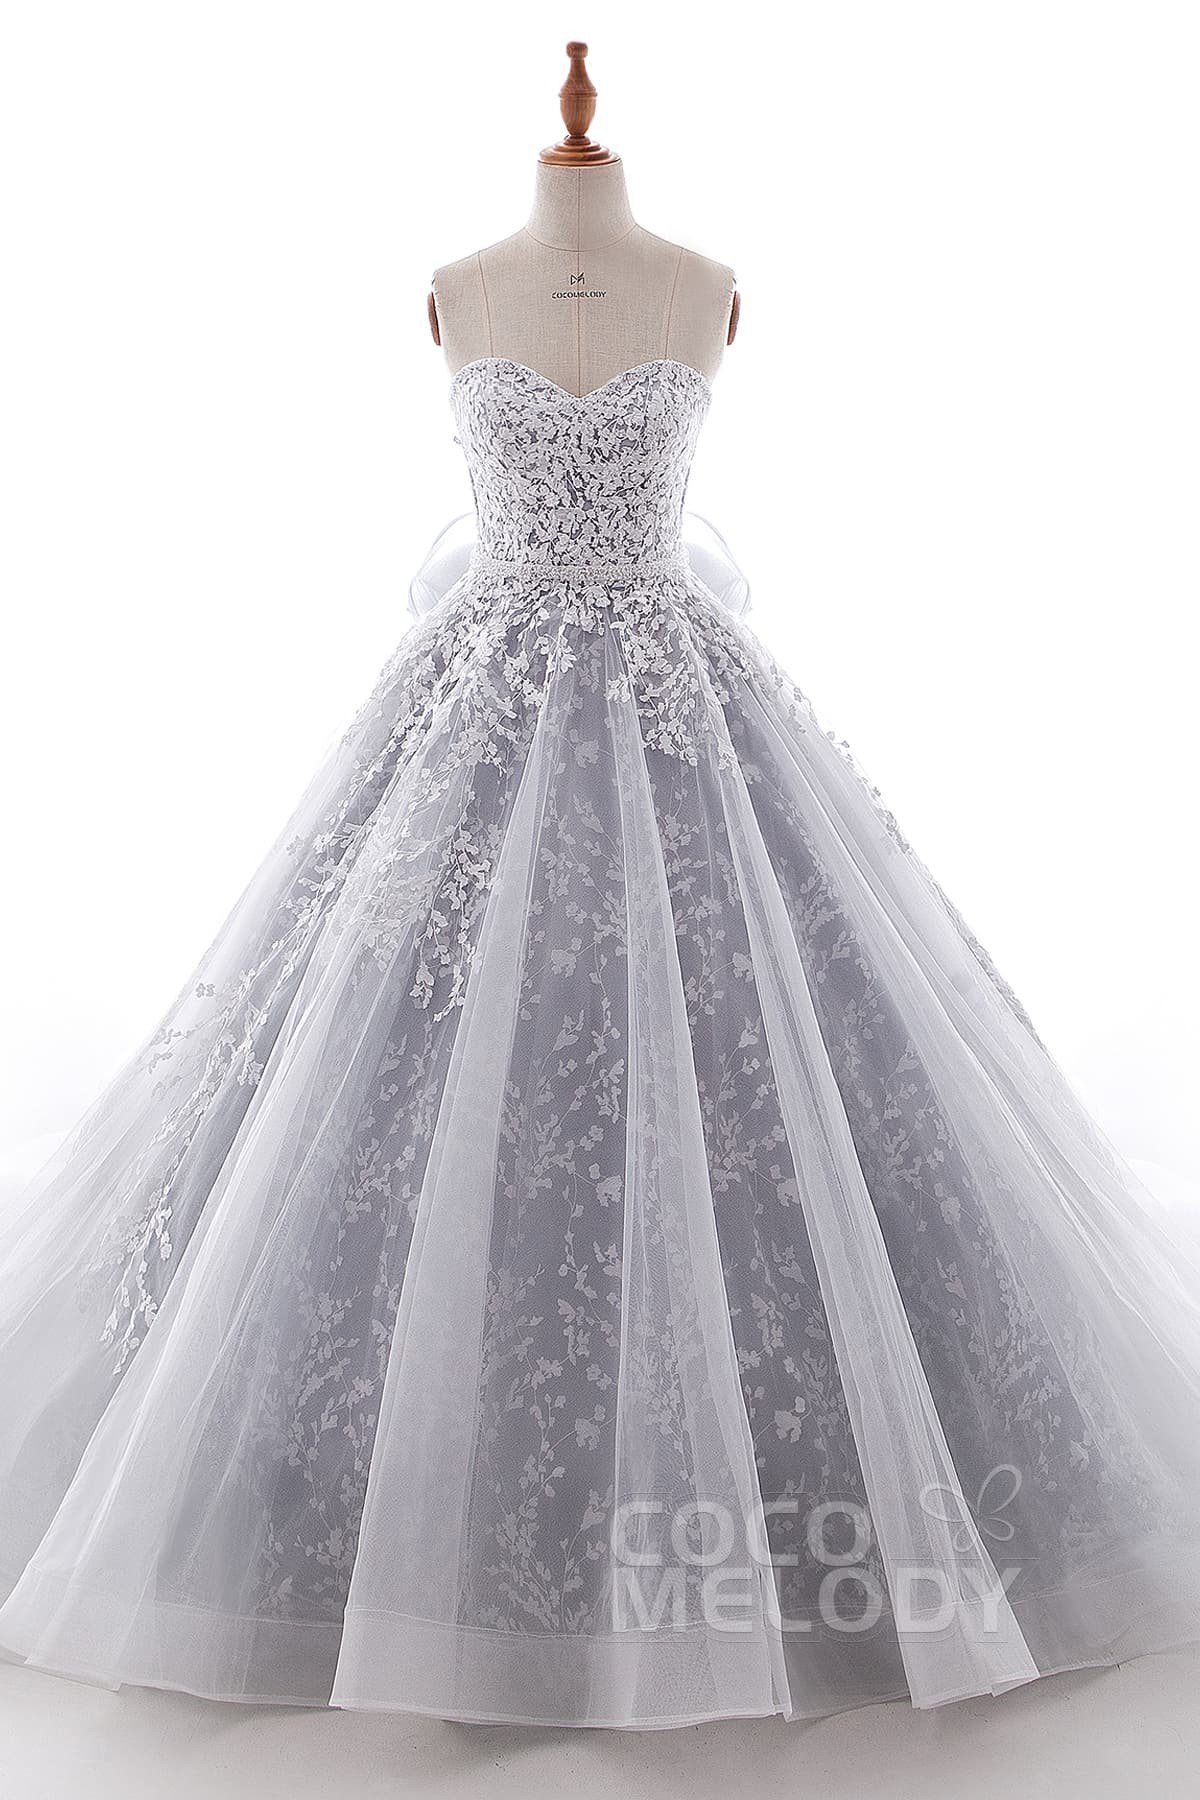 wedding dresses with corset photo - 1